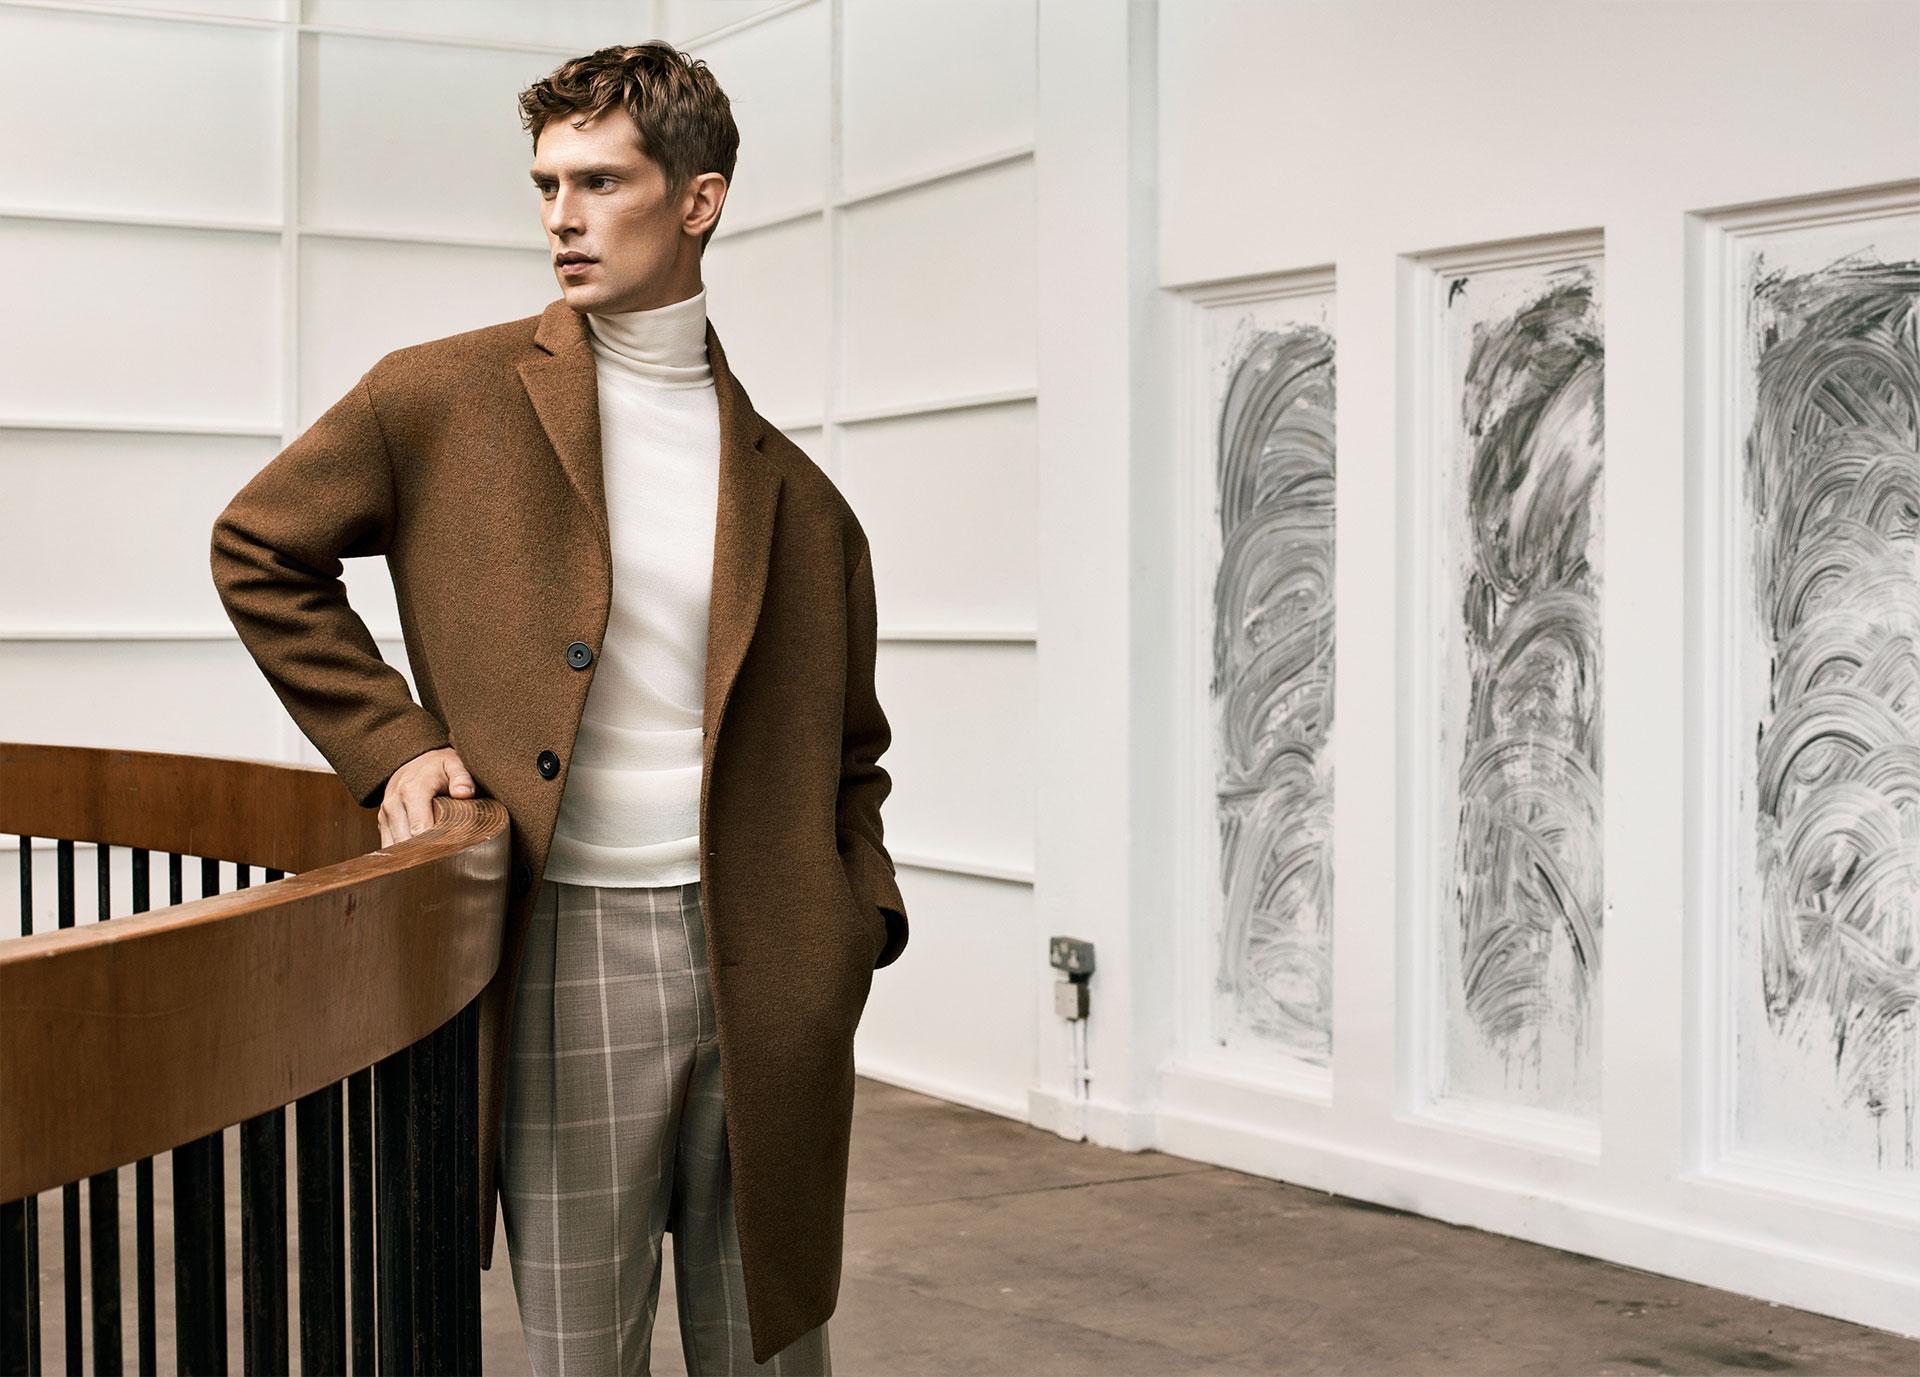 Zara Men's Studio Autumn/Winter 2016 Collection